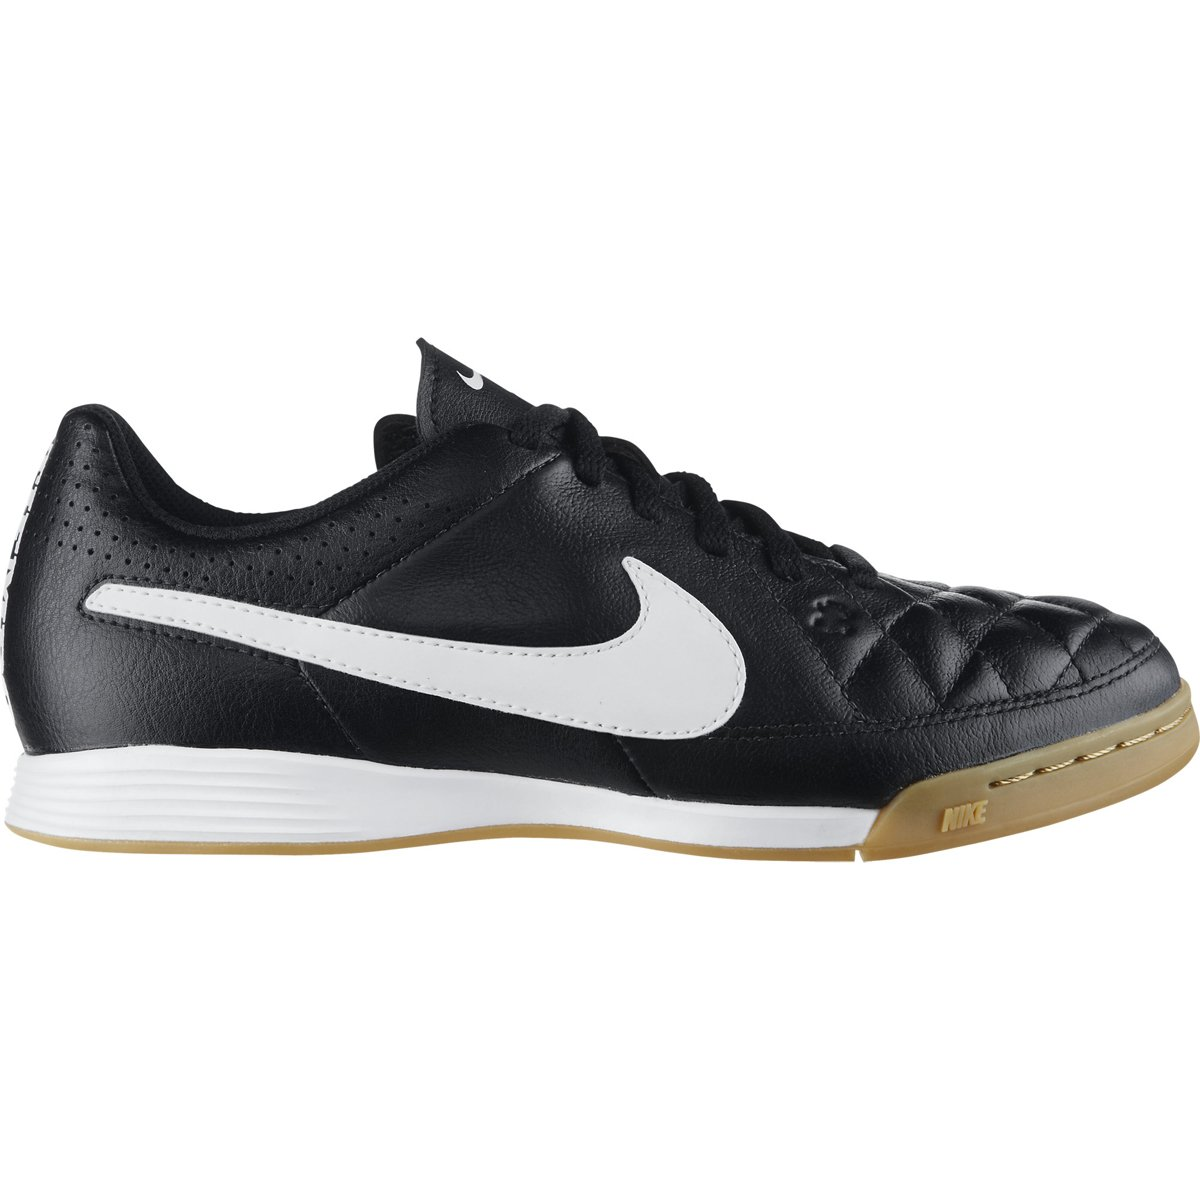 a96079fe1af5d Chuteira Nike Tiempo Gênio Leather IC Futsal Infantil - Compre Agora ...